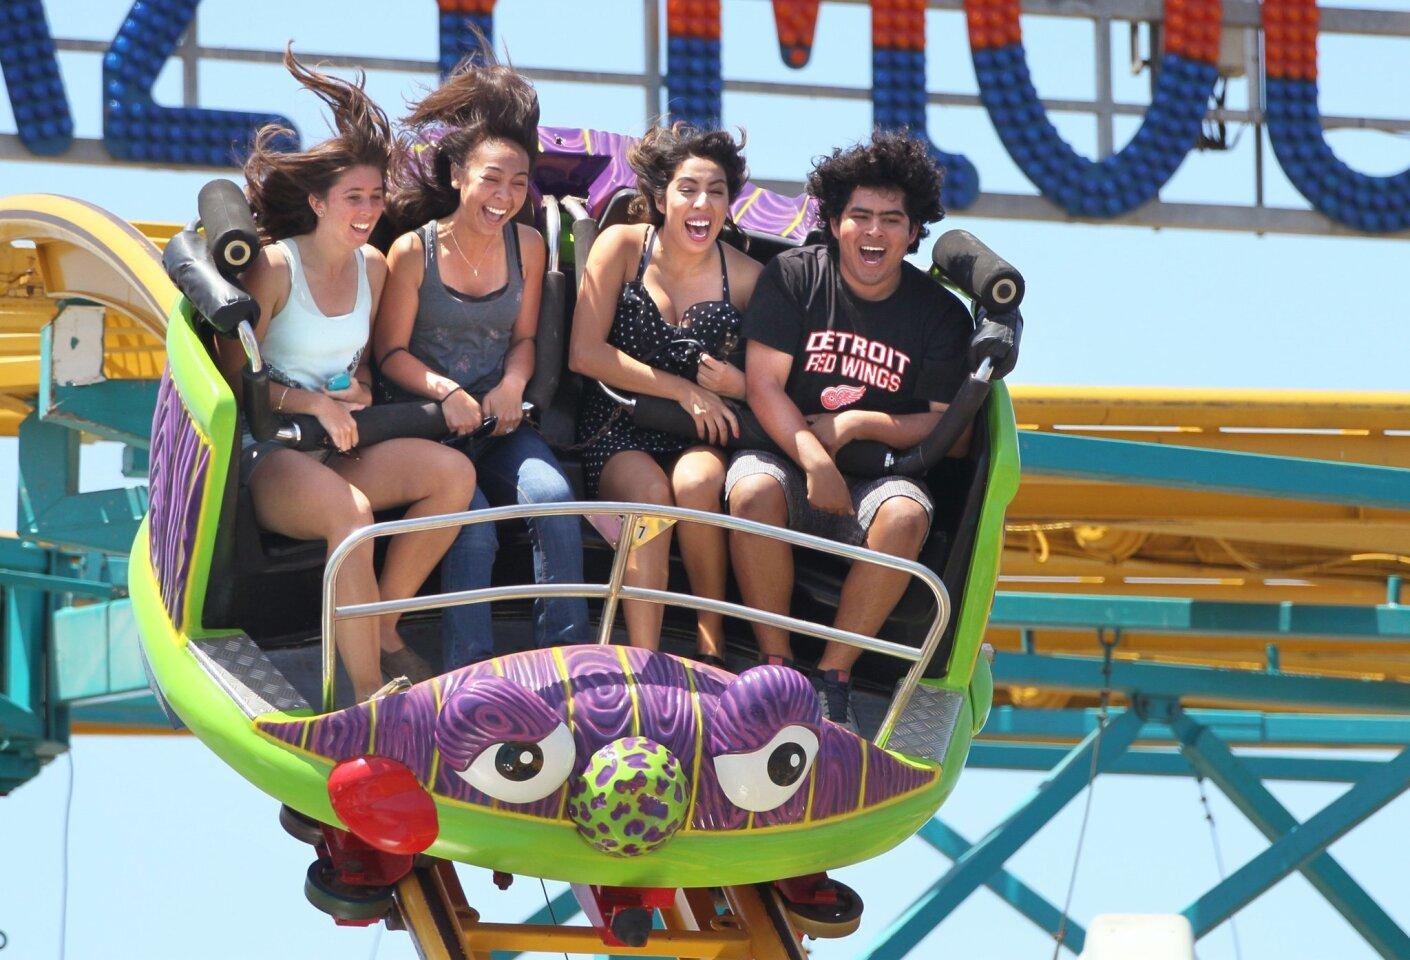 County Fair 2014 opens